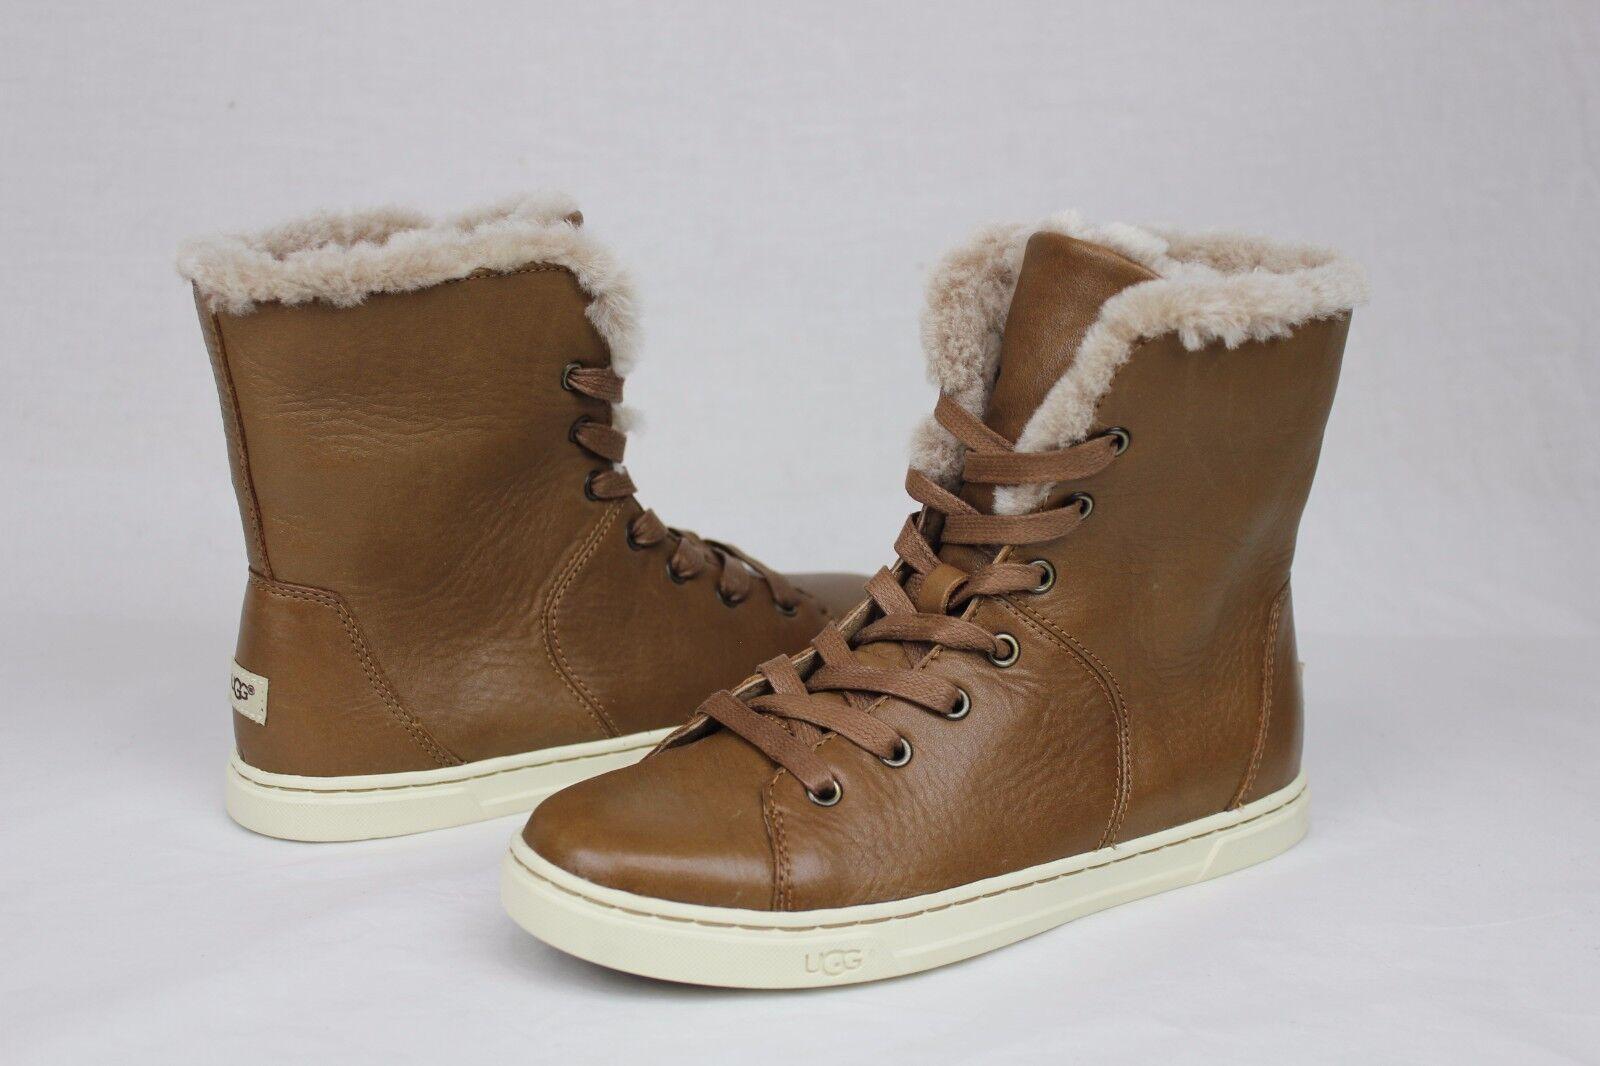 UGG Australia Womens Croft Suede Sneaker Chocolate Size 7 uLsHaBzF